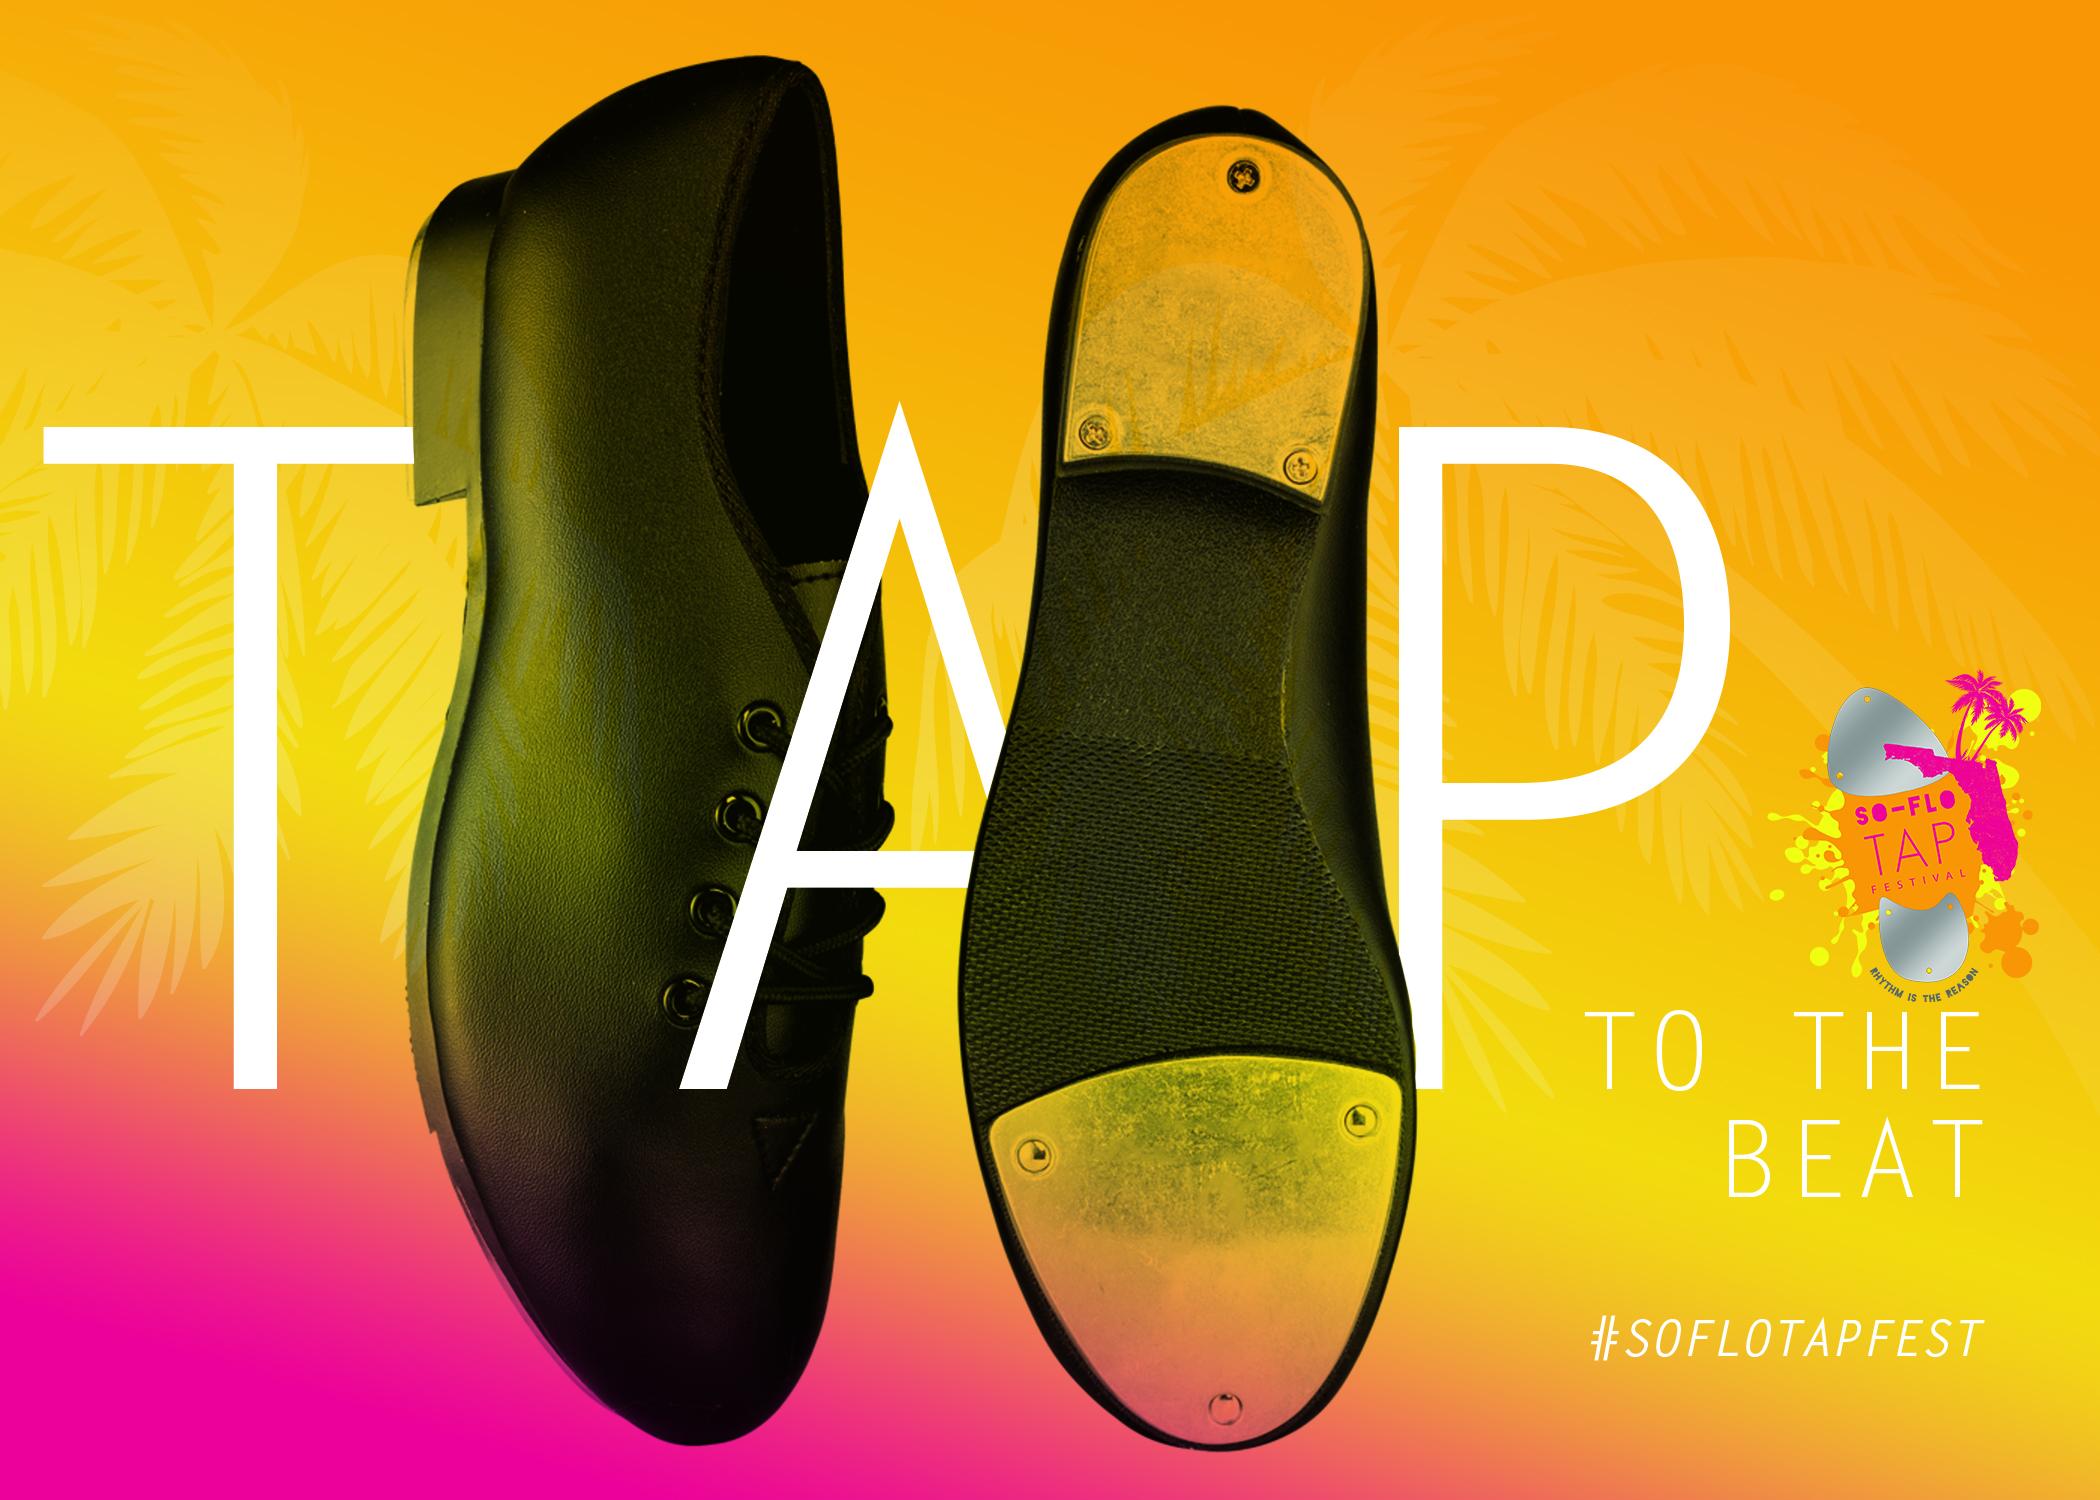 17_tap-to-the-rhythm.jpg